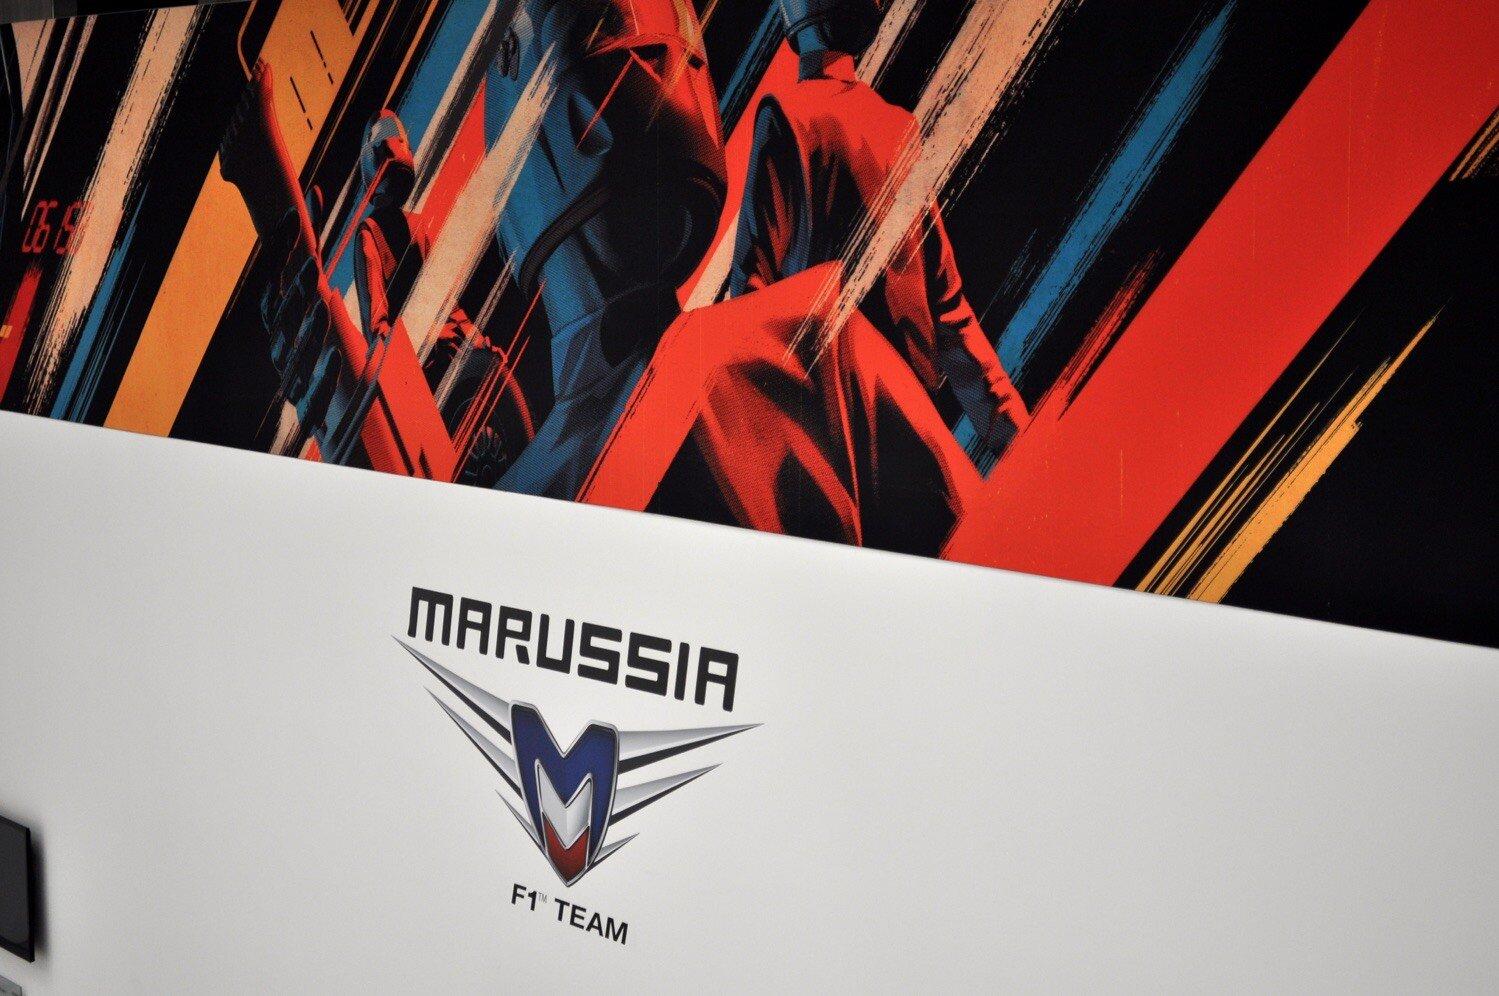 tavis-coburn-F1-team-graphic-illustration-marussia-26.jpg